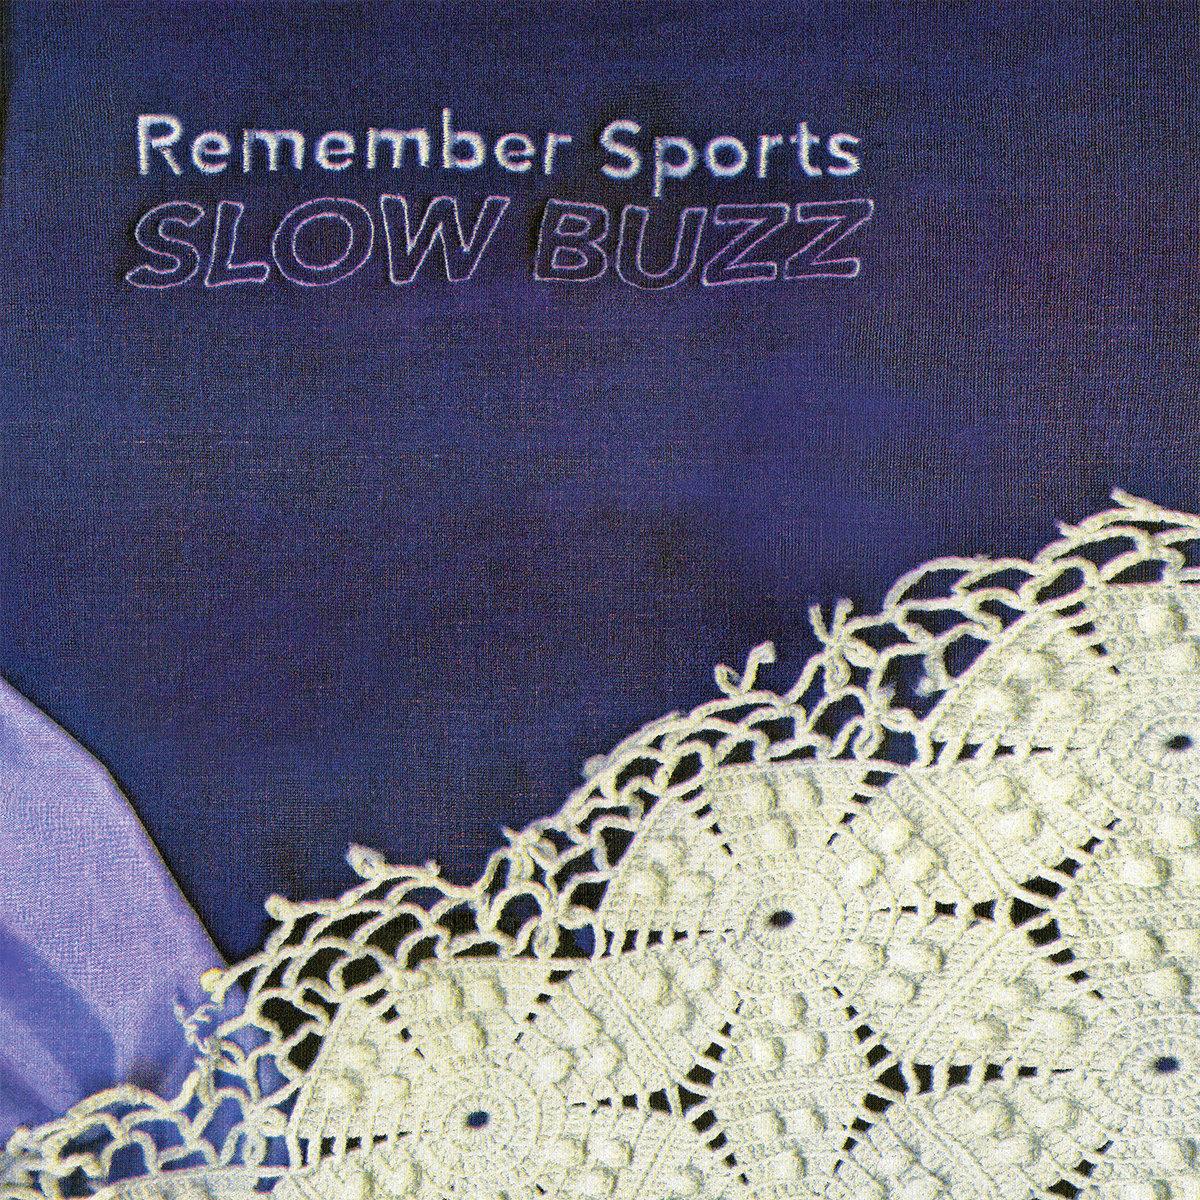 remember sports slow buzz album art